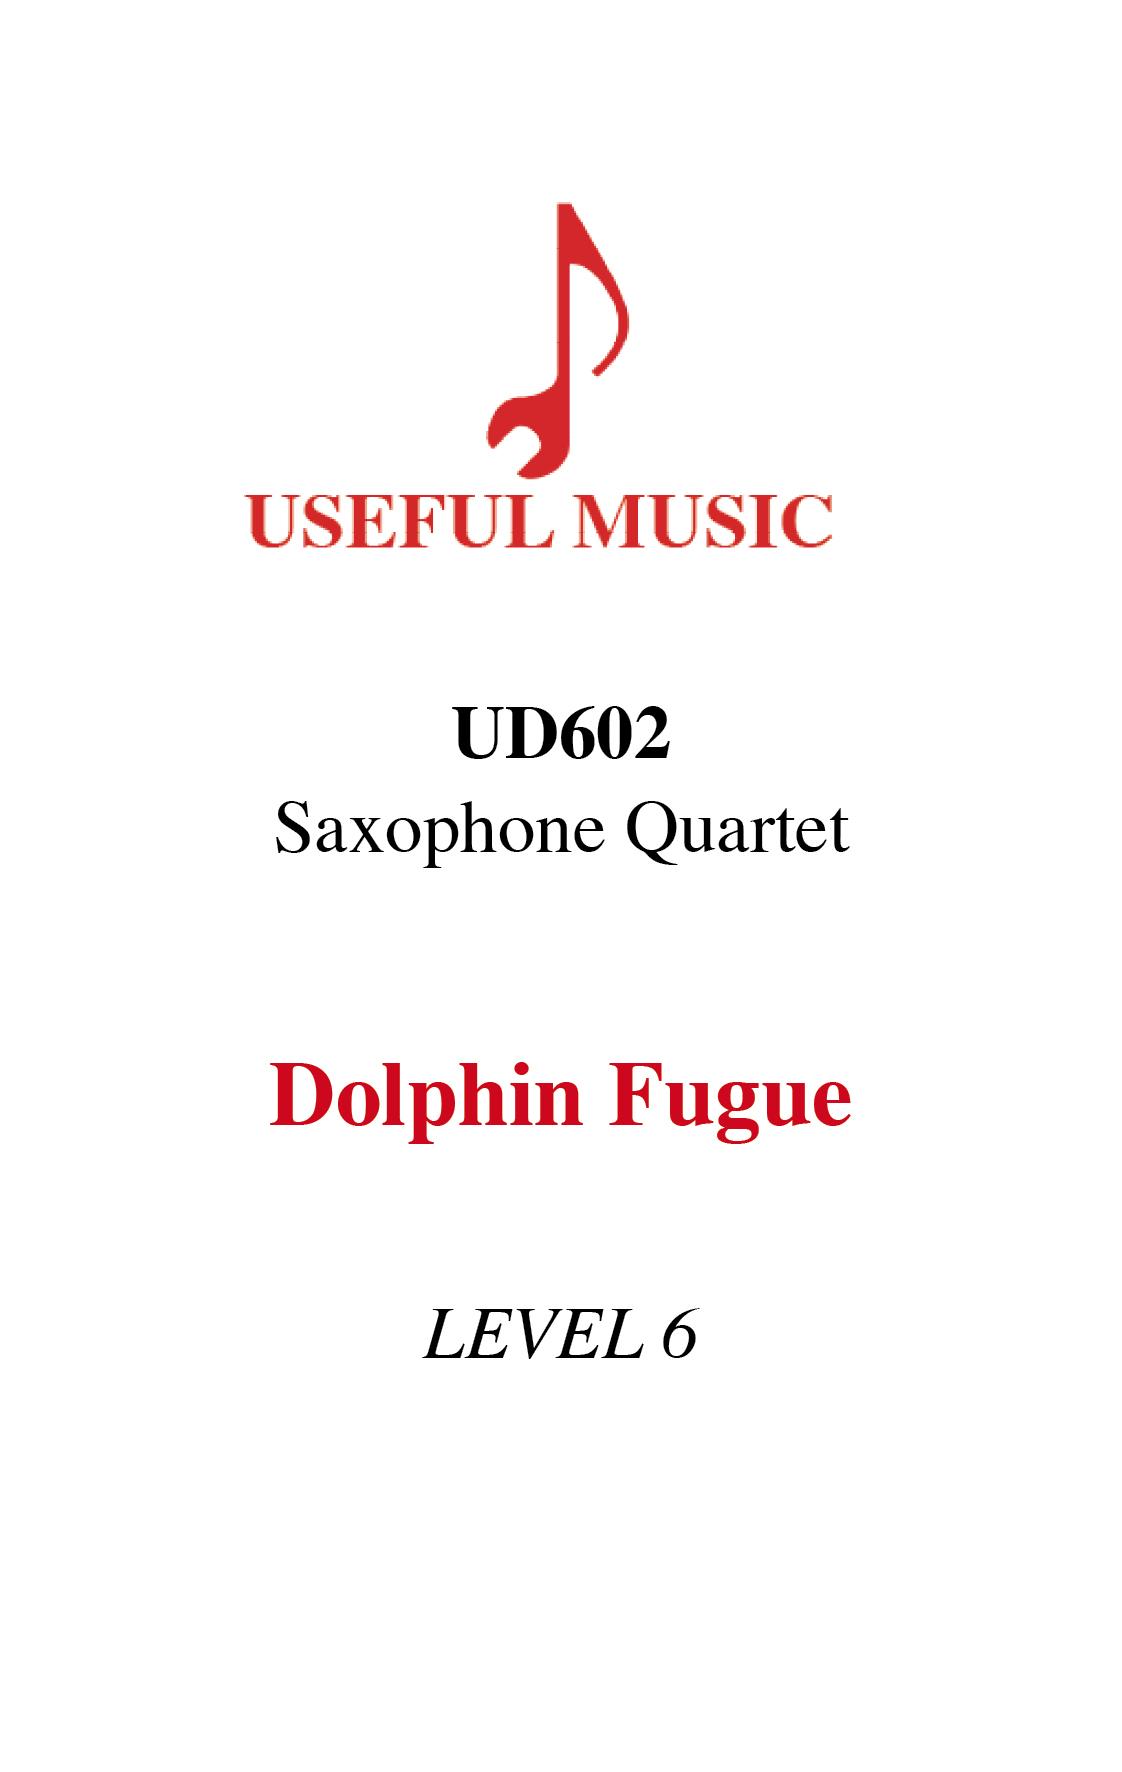 Dolphin Fugue - saxophone quartet